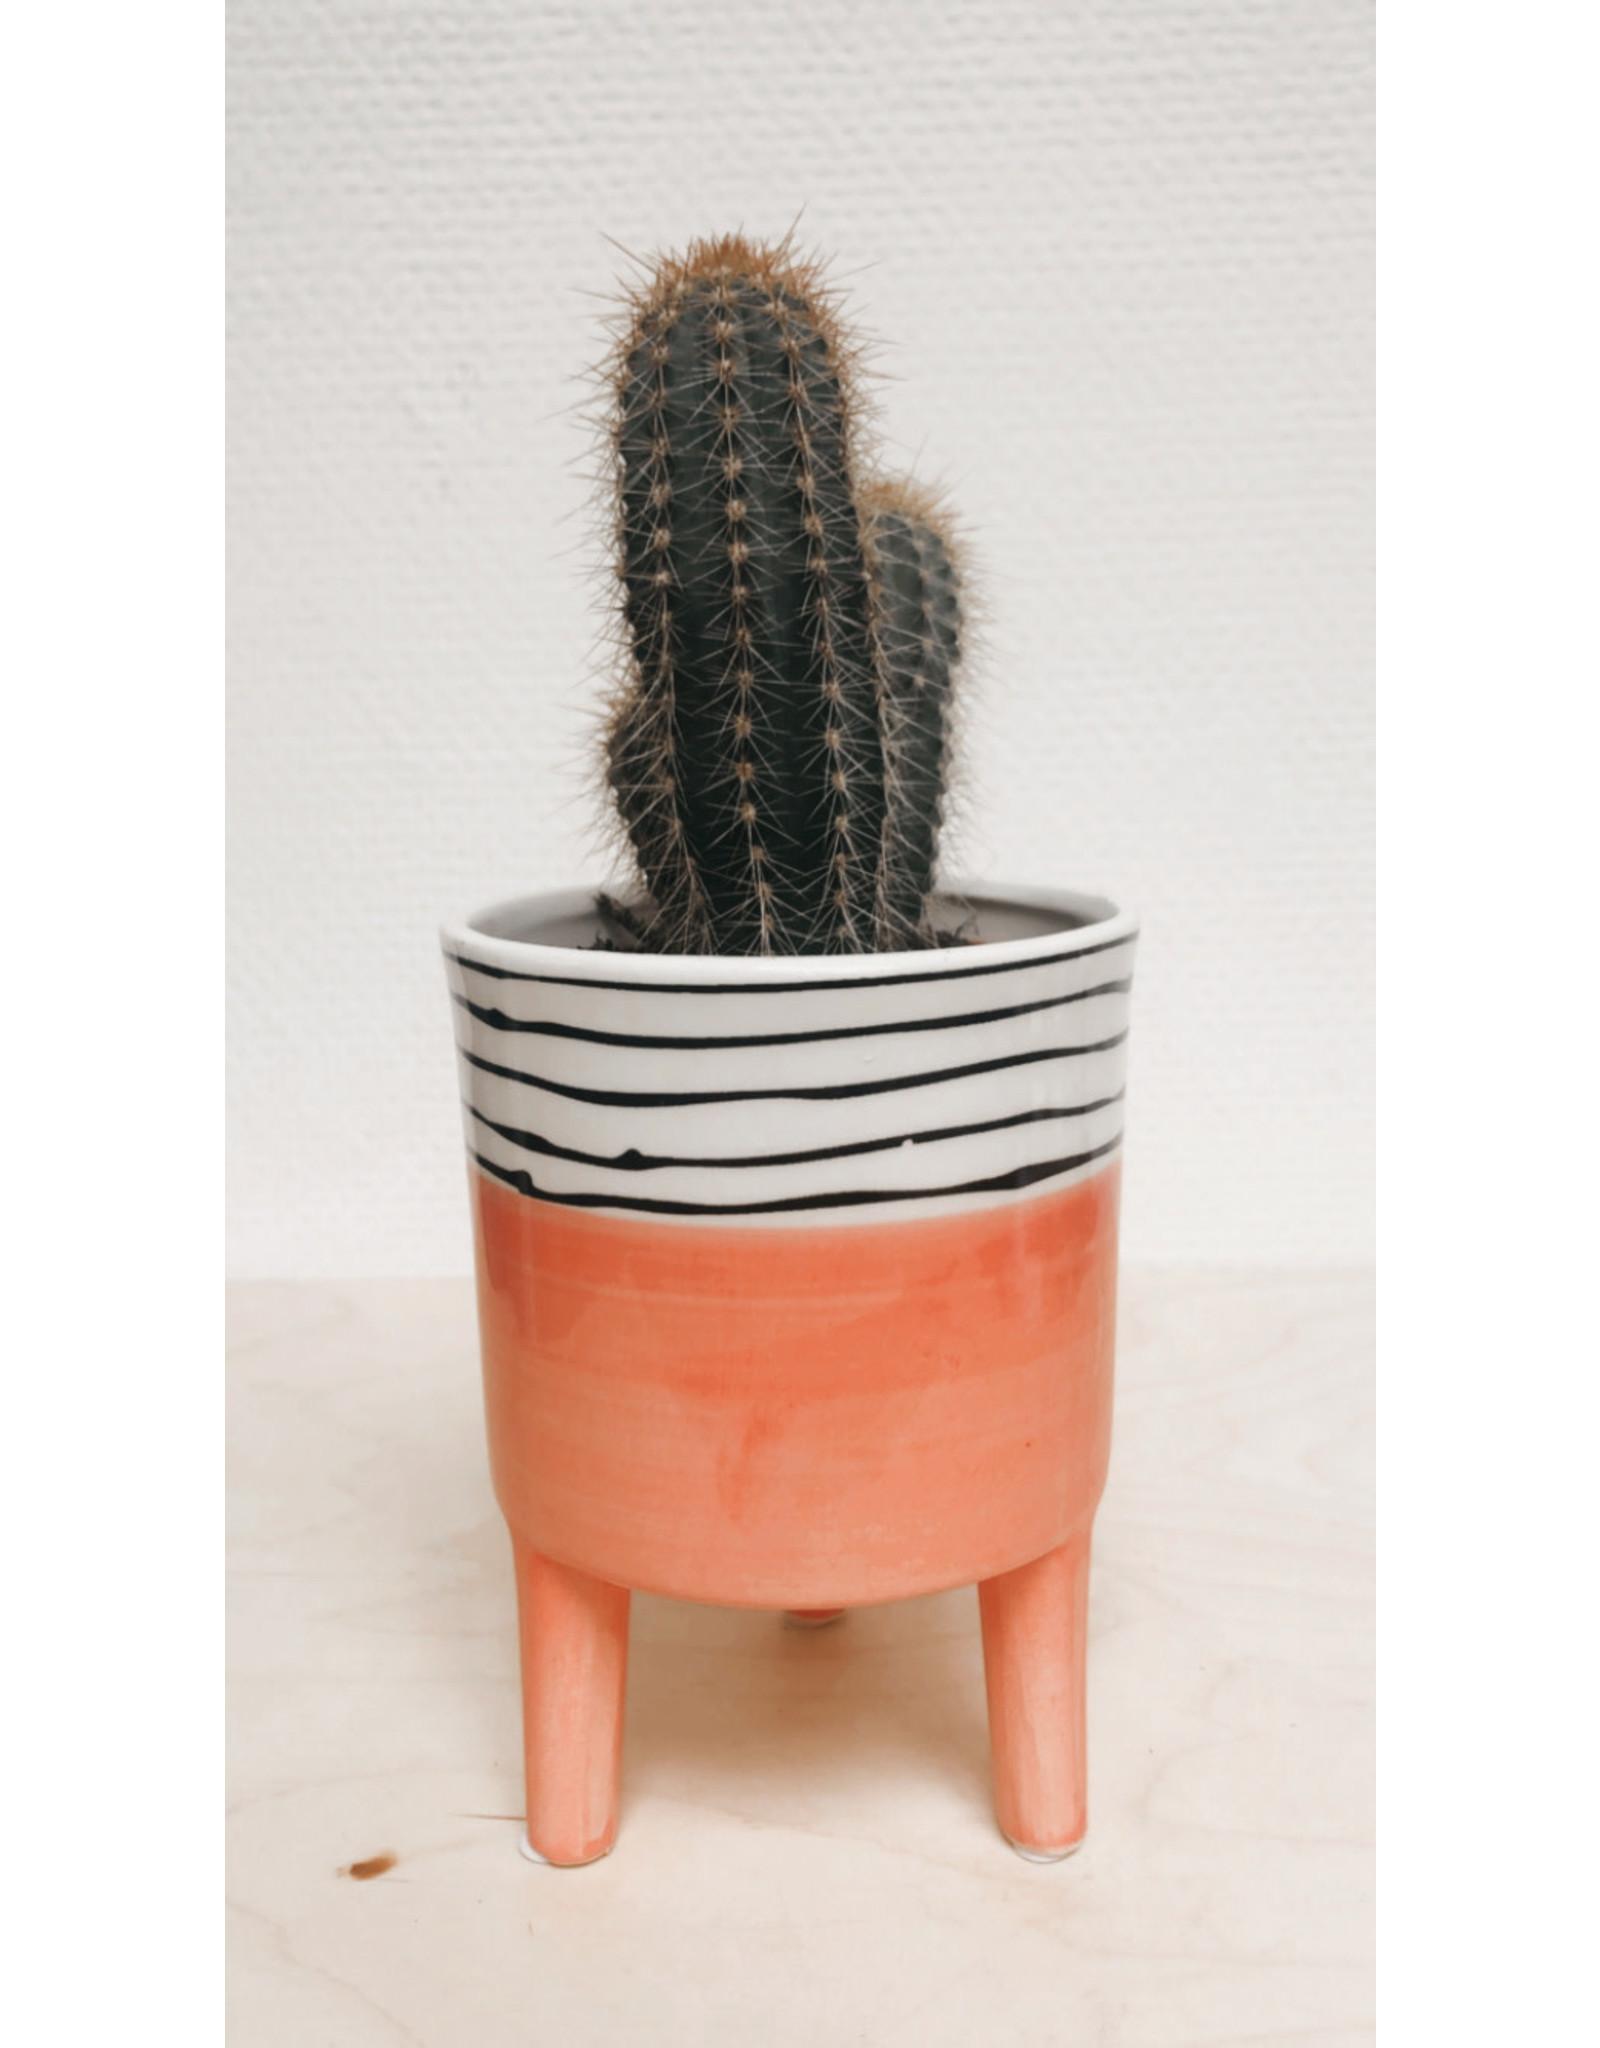 Plantophile Bloempot 3 pootjes - Oranje & Horizontale lijntjes - Ø 10 x H 13 cm